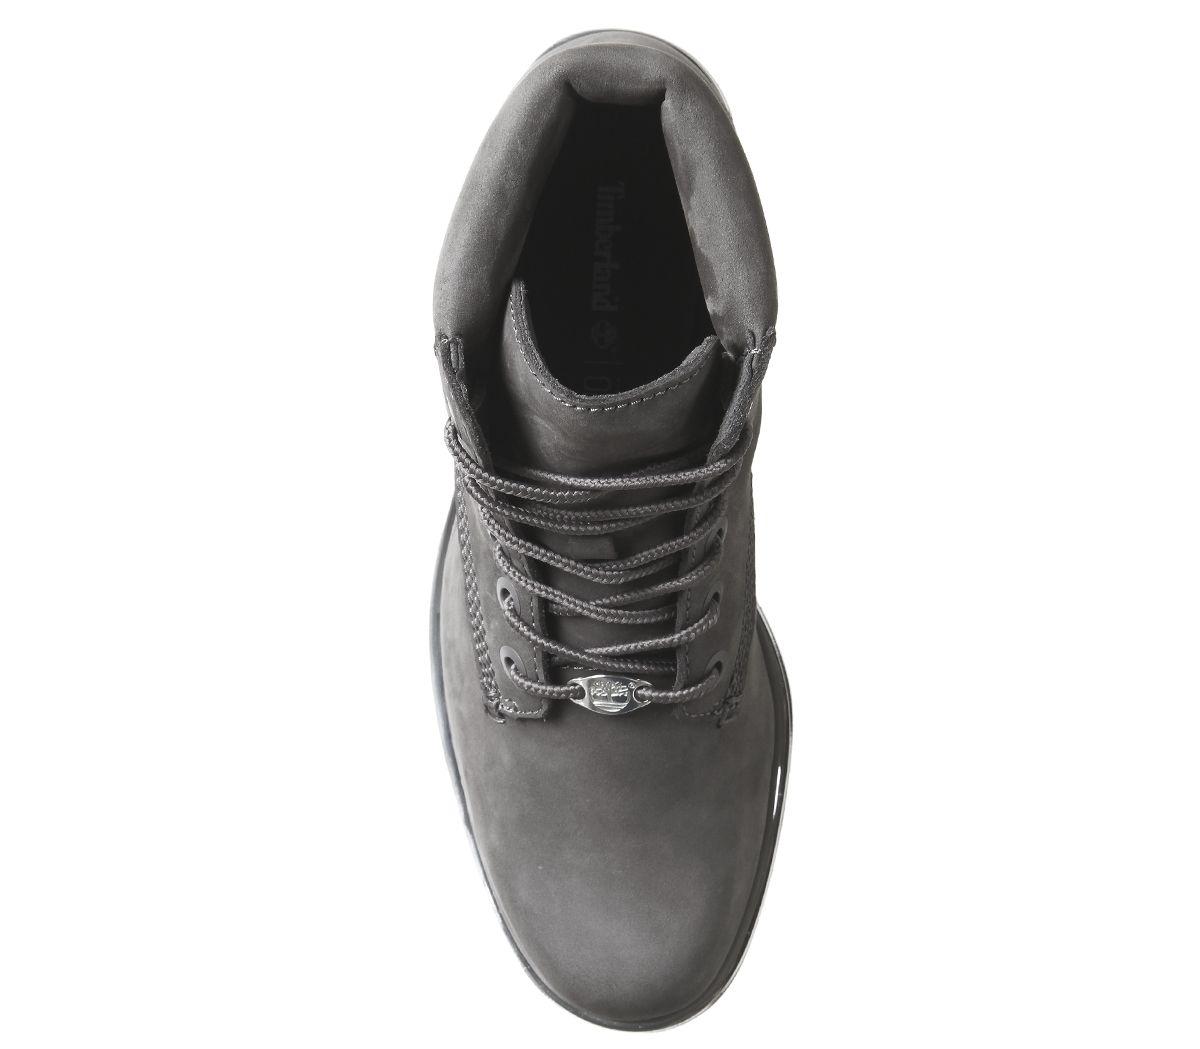 0941748bac2b Womens Timberland Slim Premium 6 Inch Boots Eiffel Tower Silver Rand ...